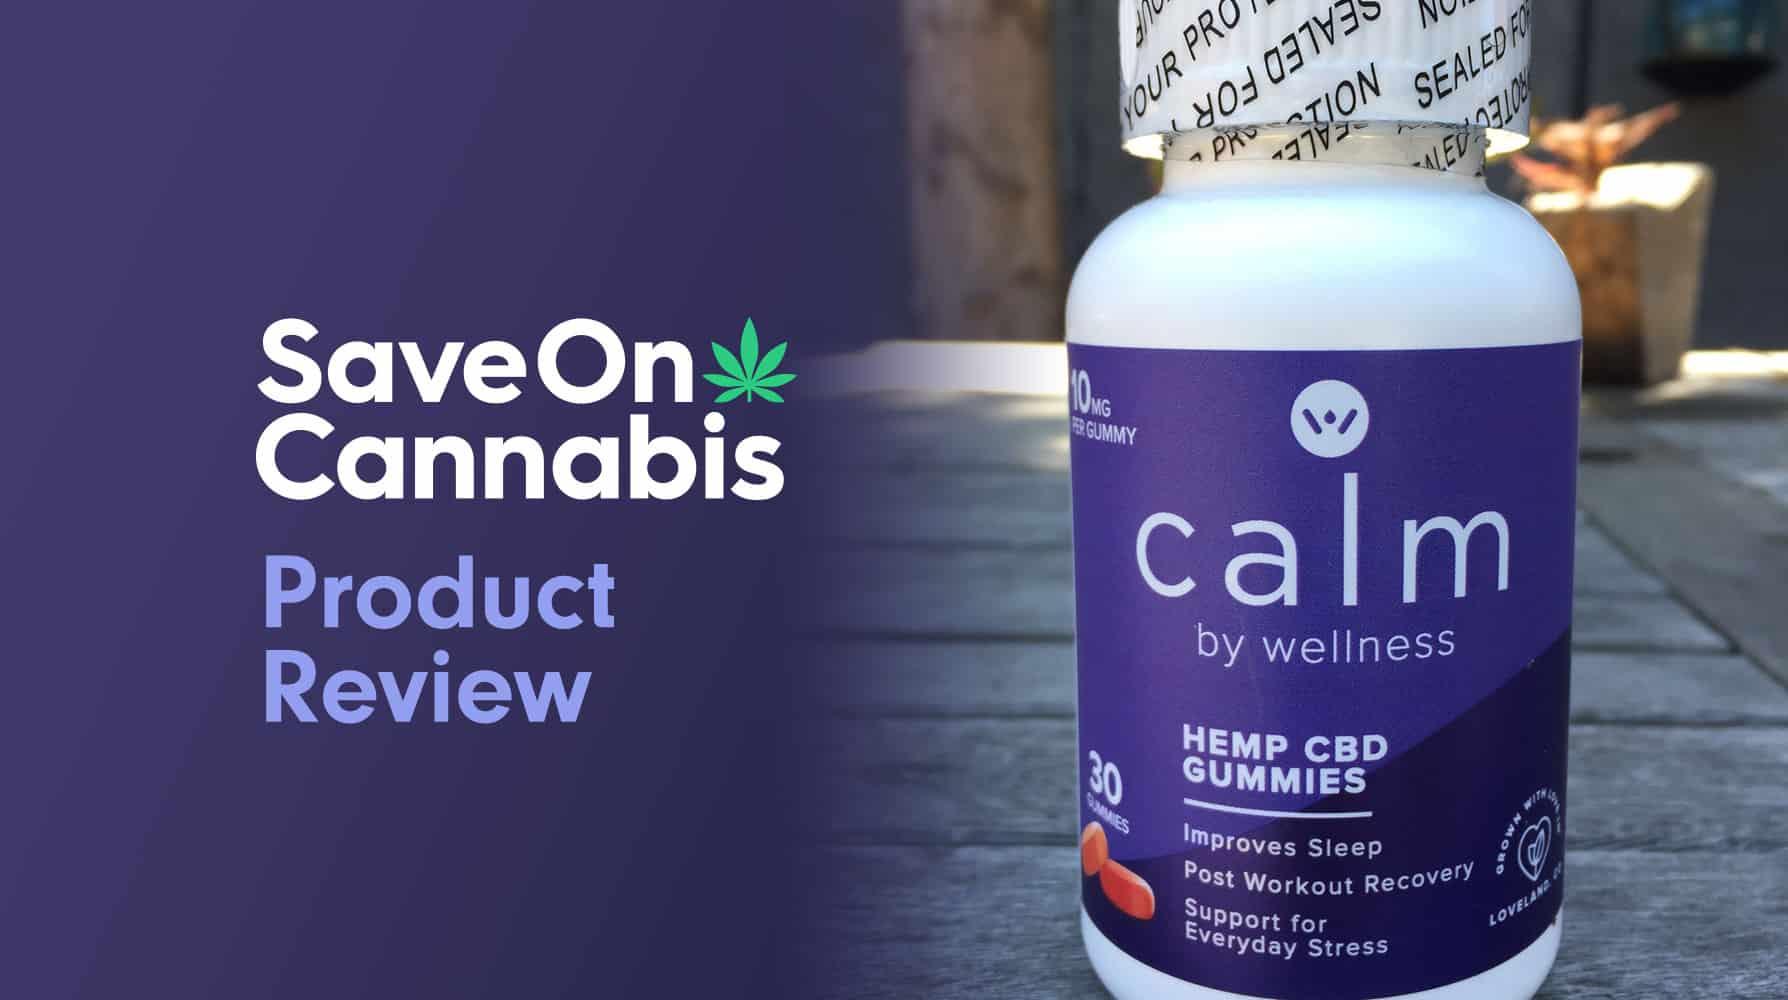 calm by wellness hemp cbd gummies save on cannabis review website redesigned